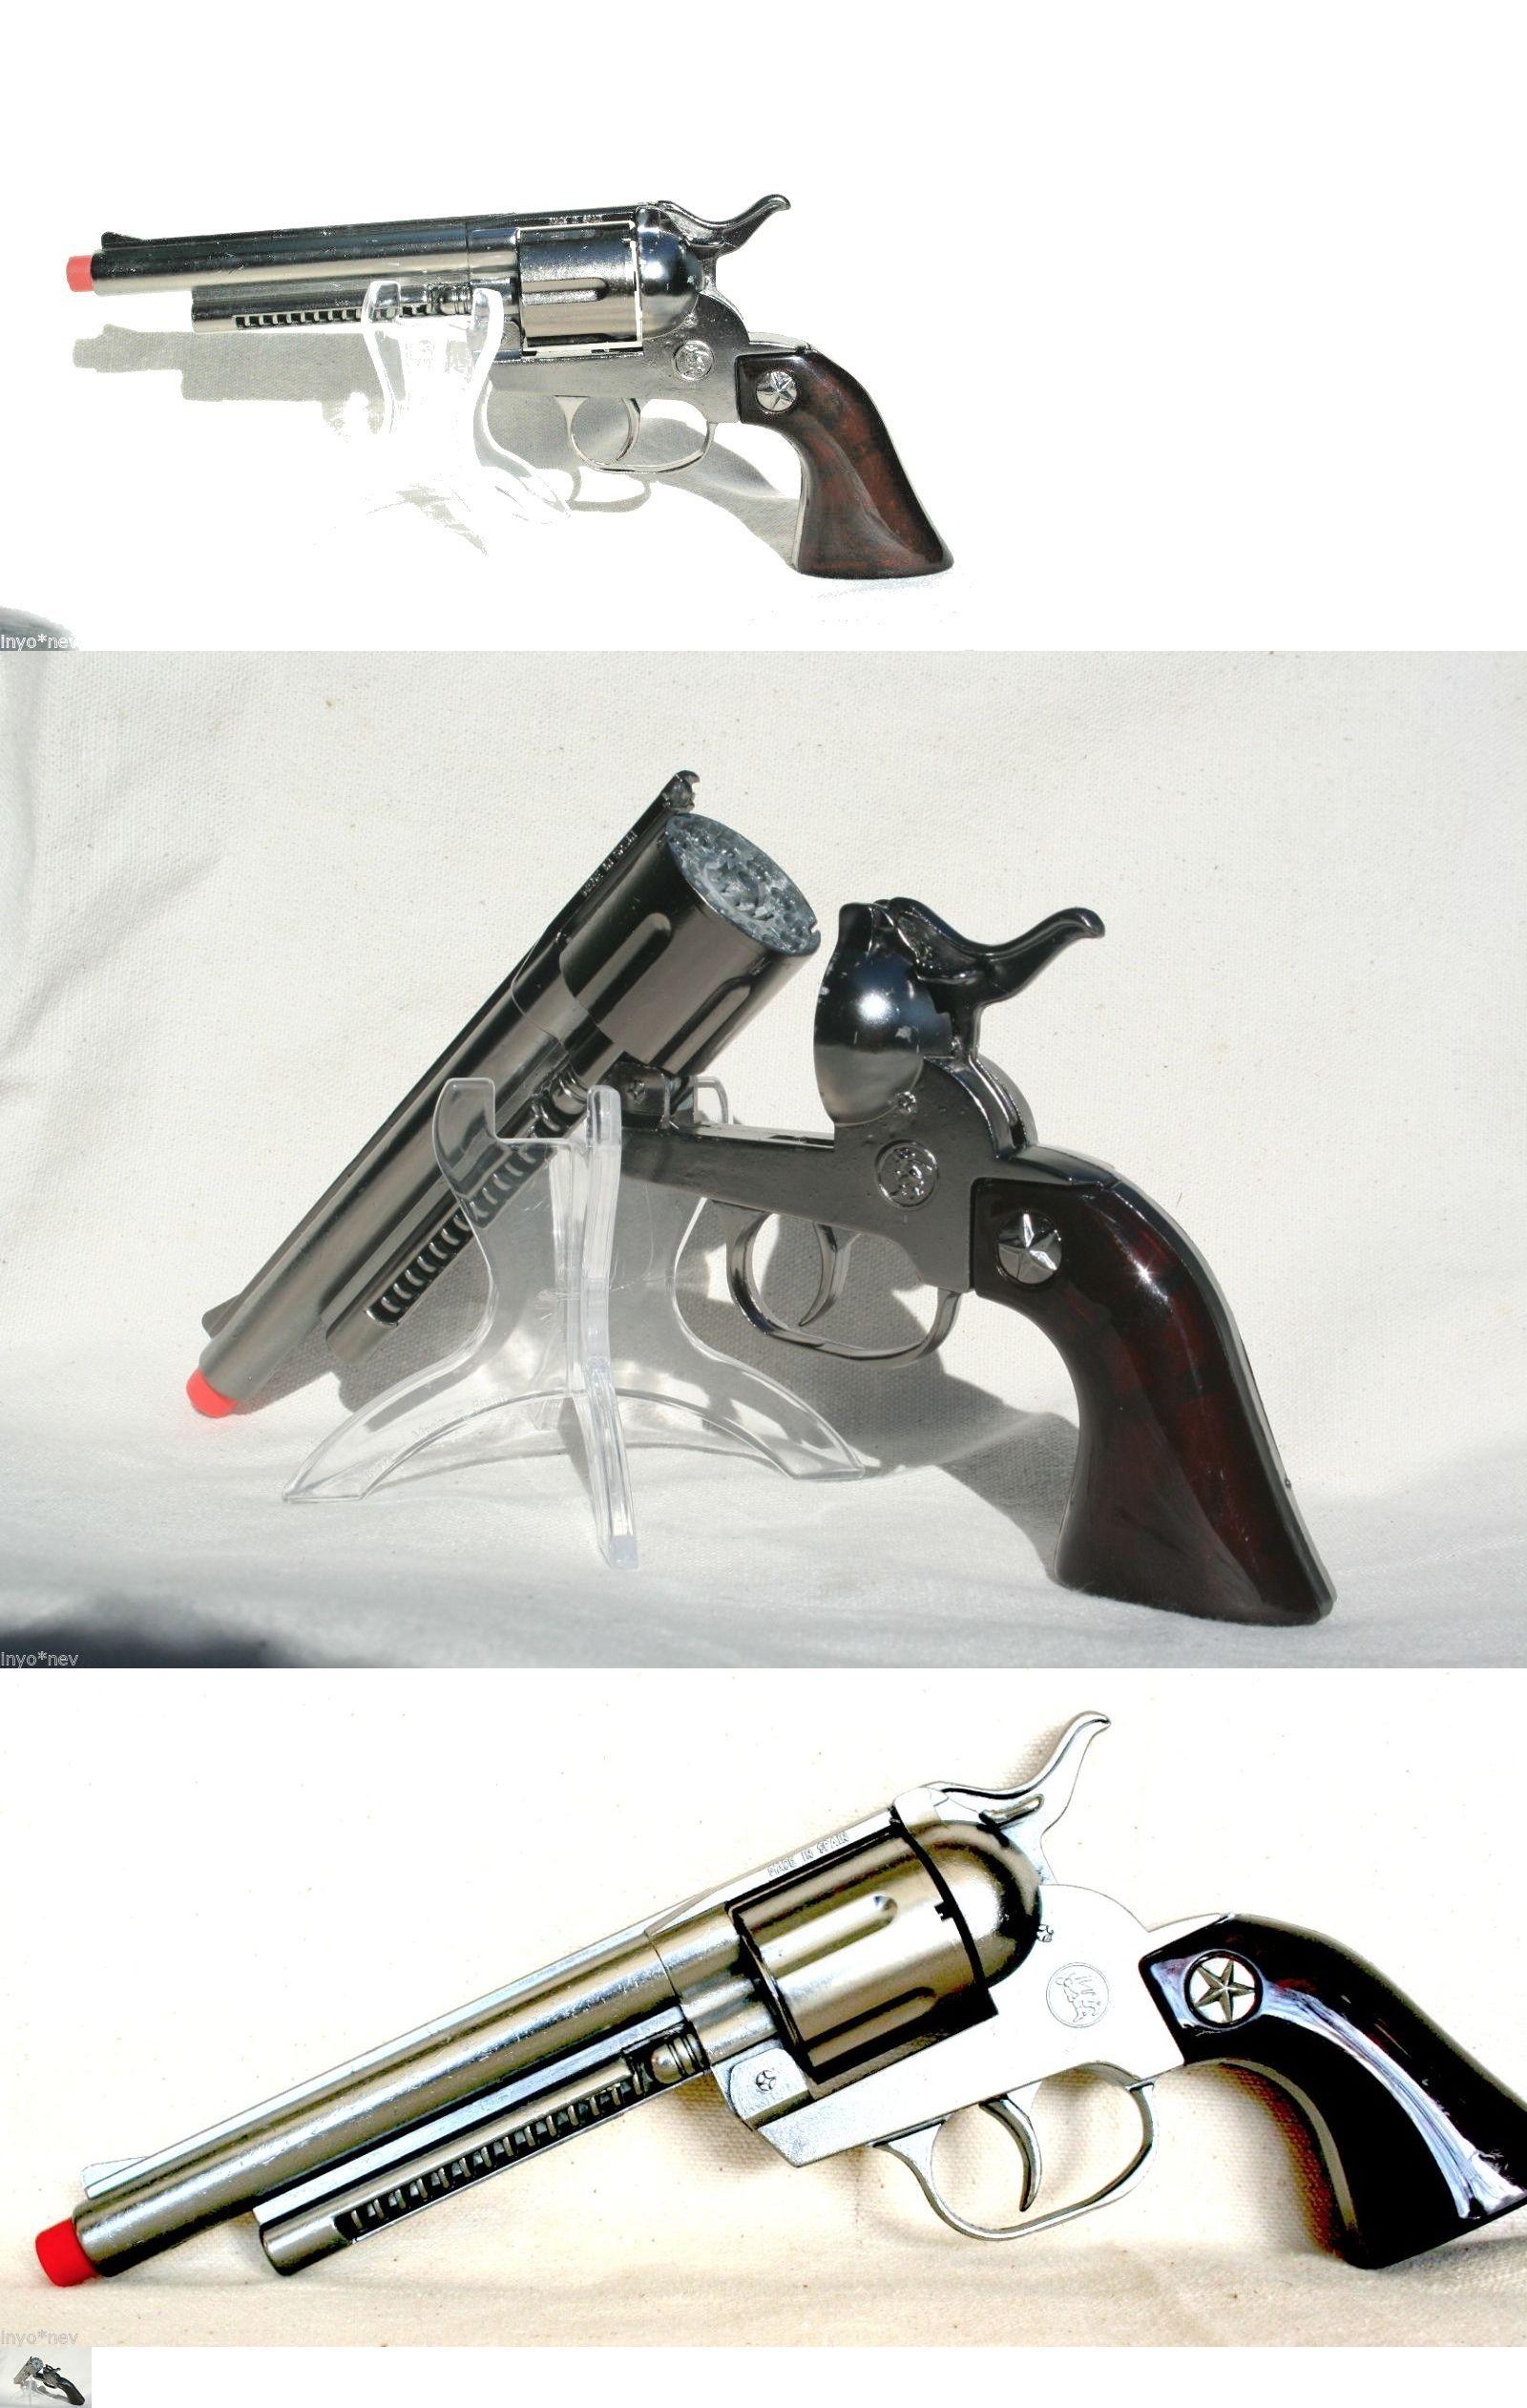 Pin On Cap Guns And Toy Pistols And B B Guns